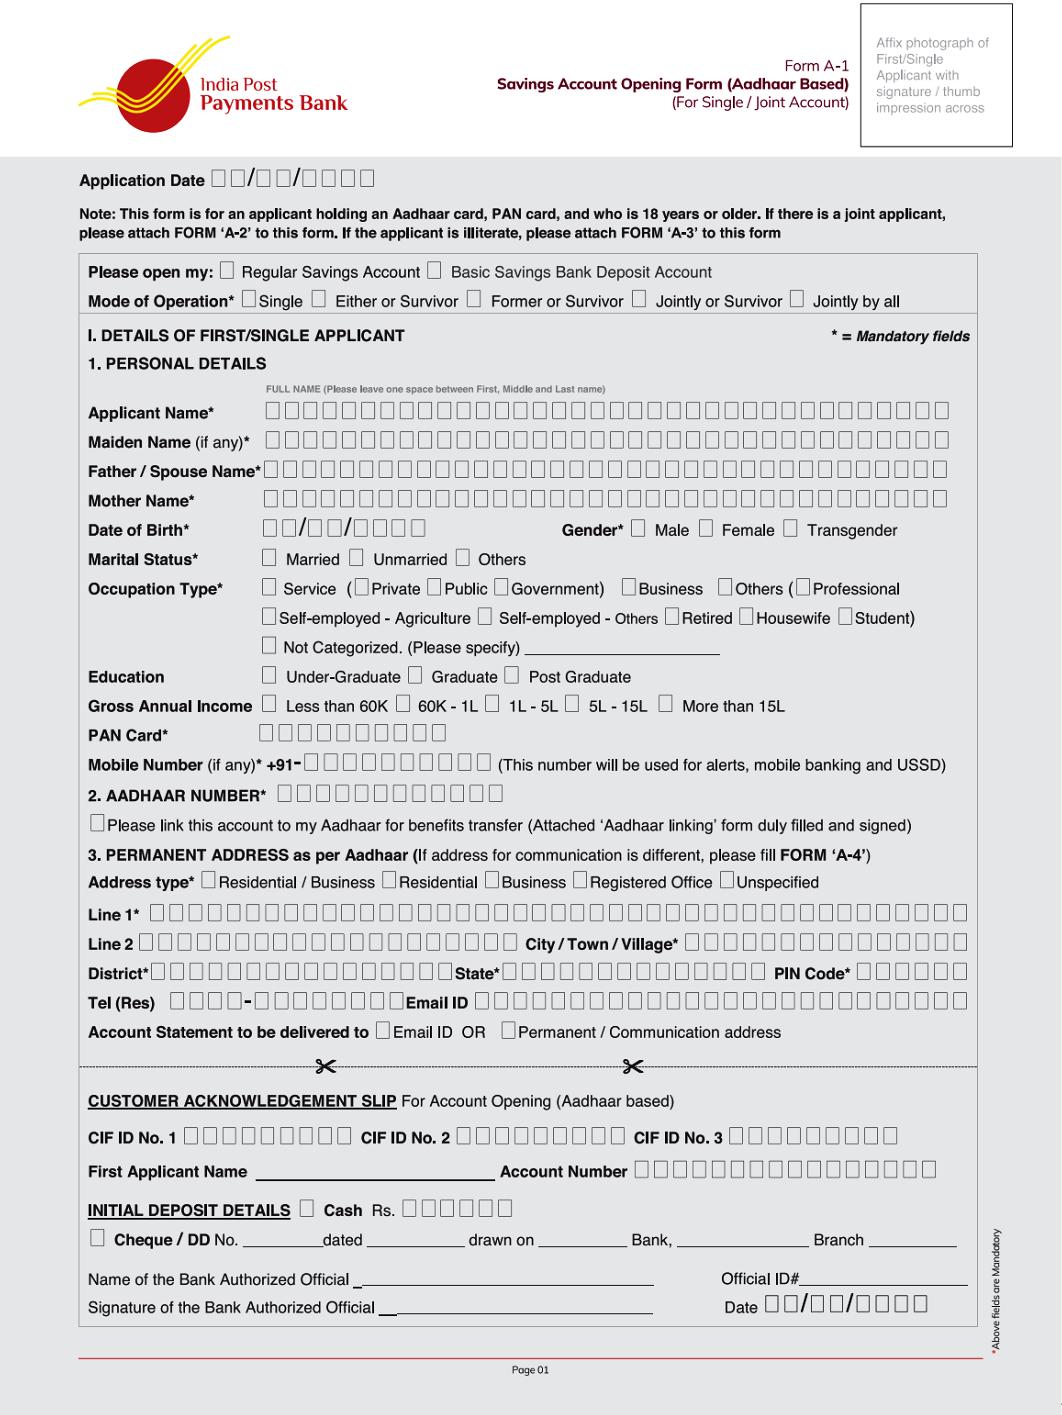 استعلام خودرو توقیفی India Post Payment Bank (IPPB) Account Opening Form ...